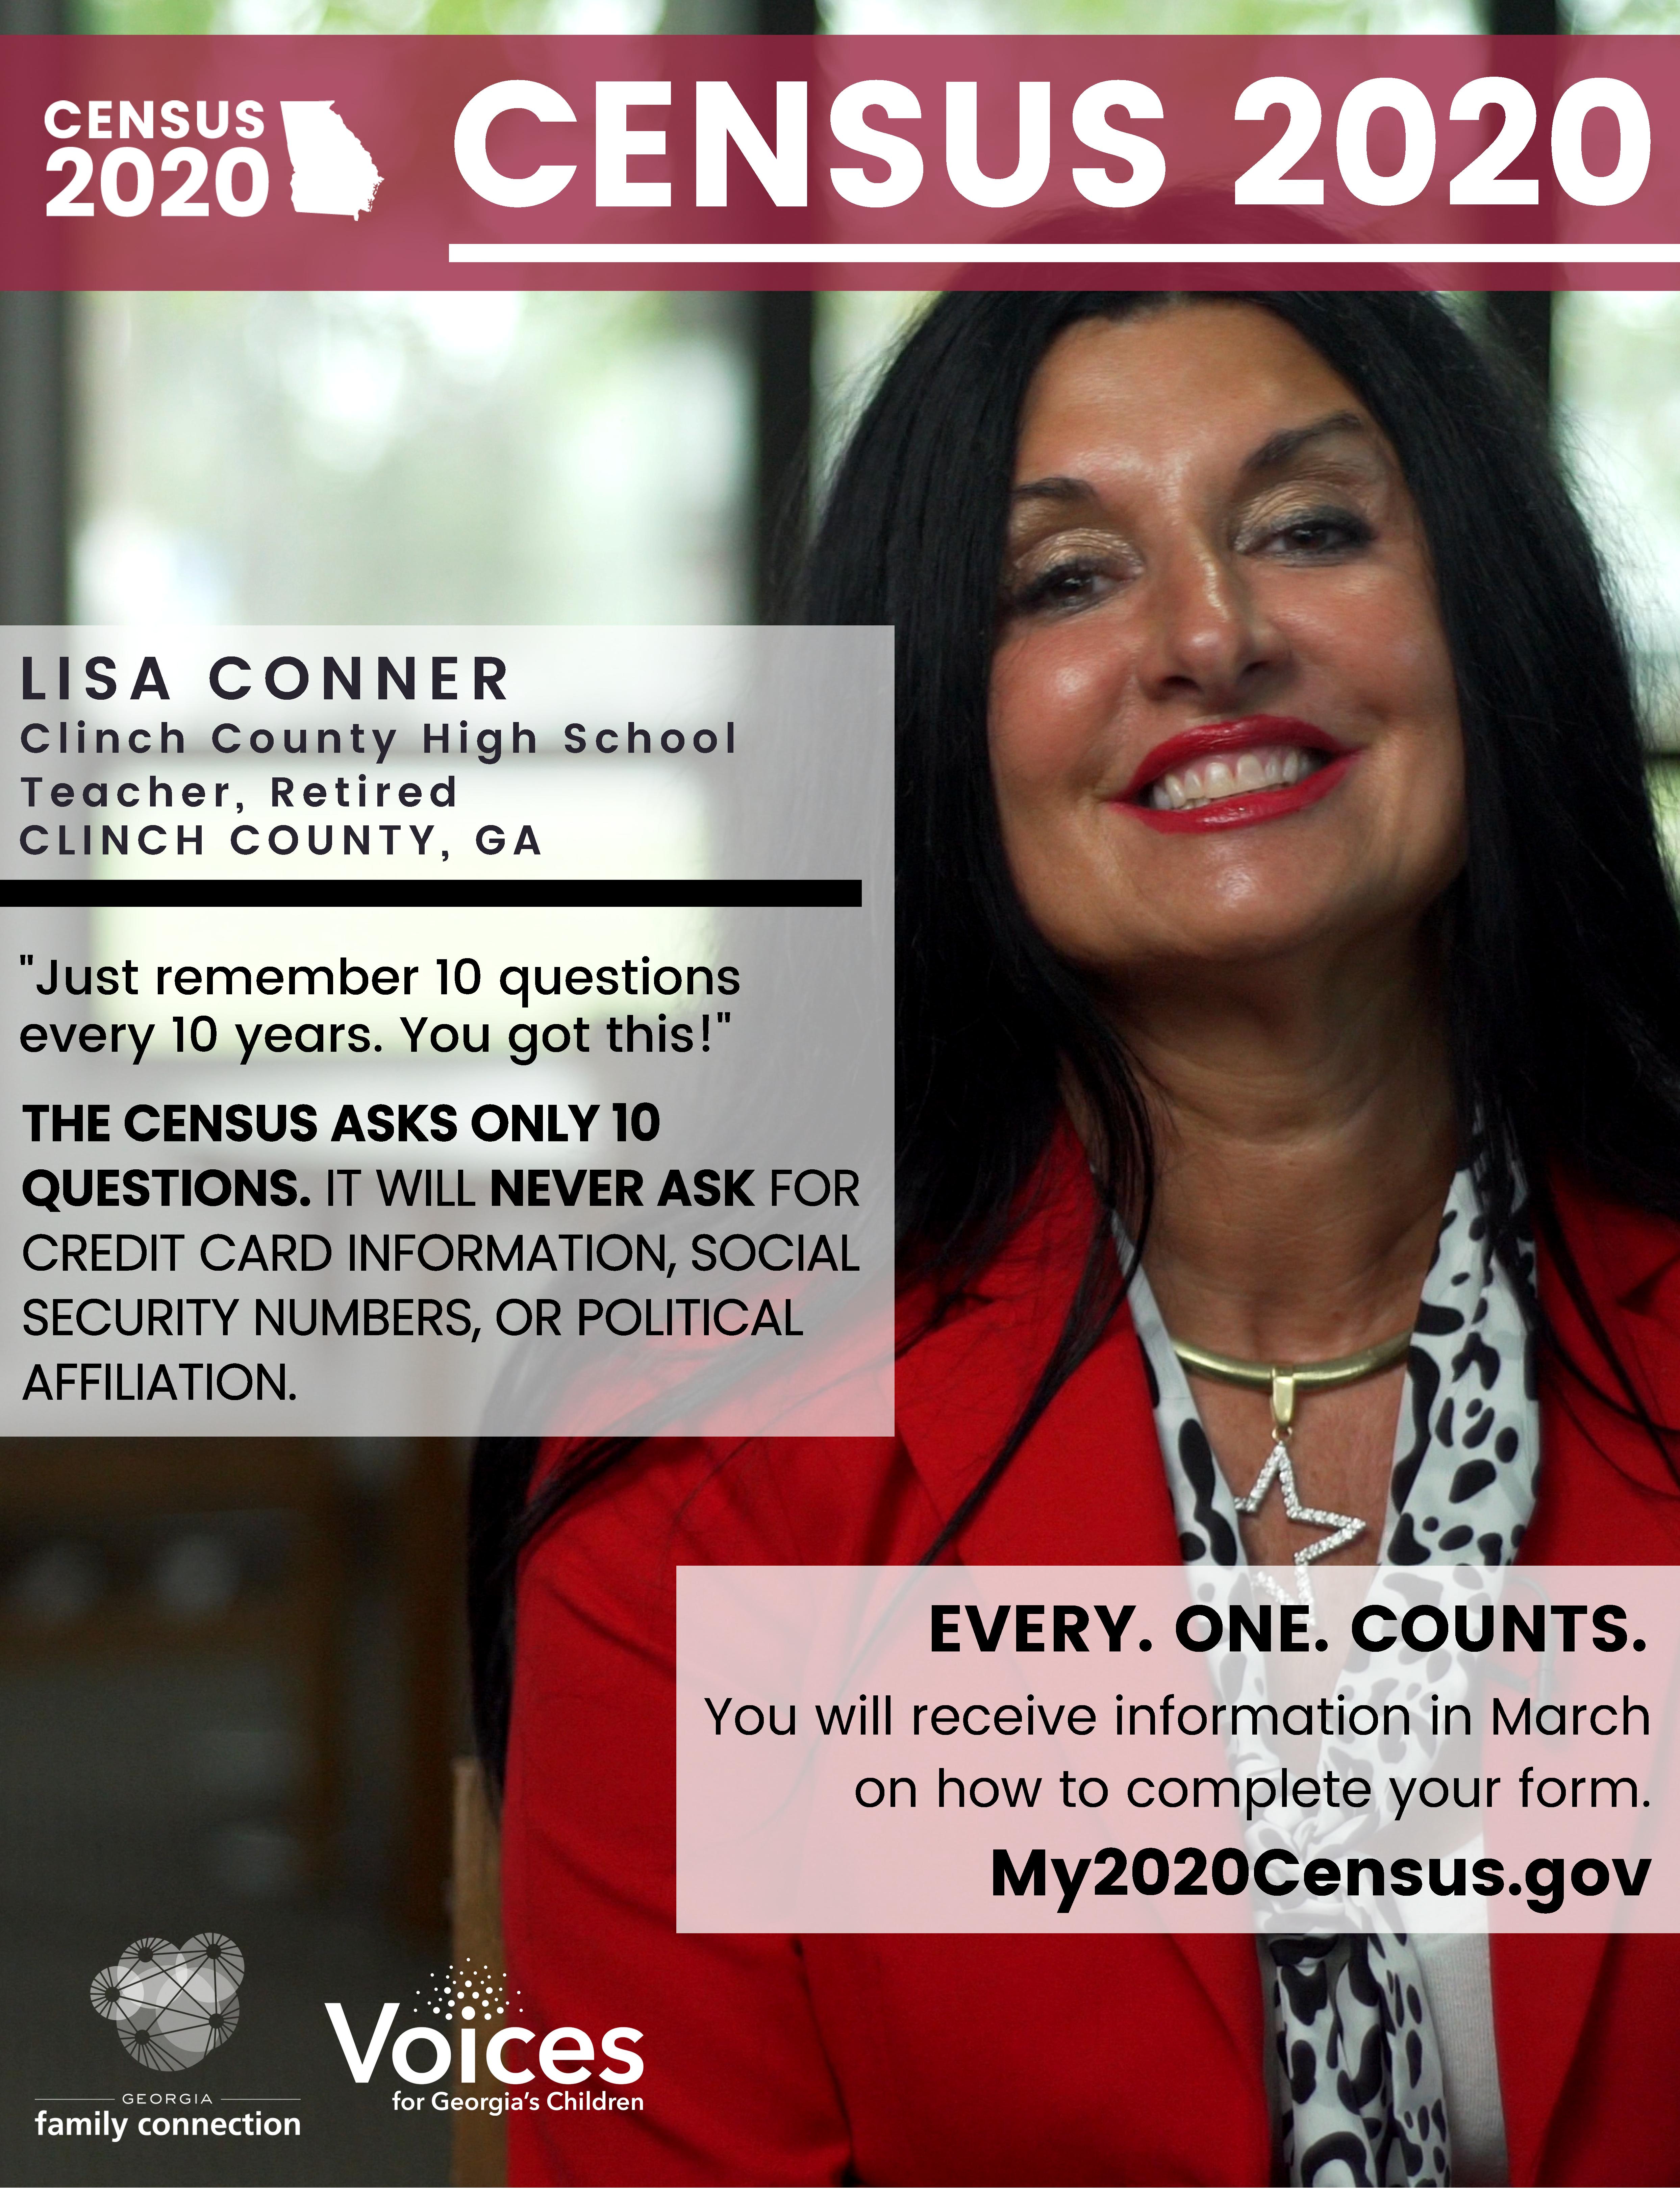 Lisa Conner Poster